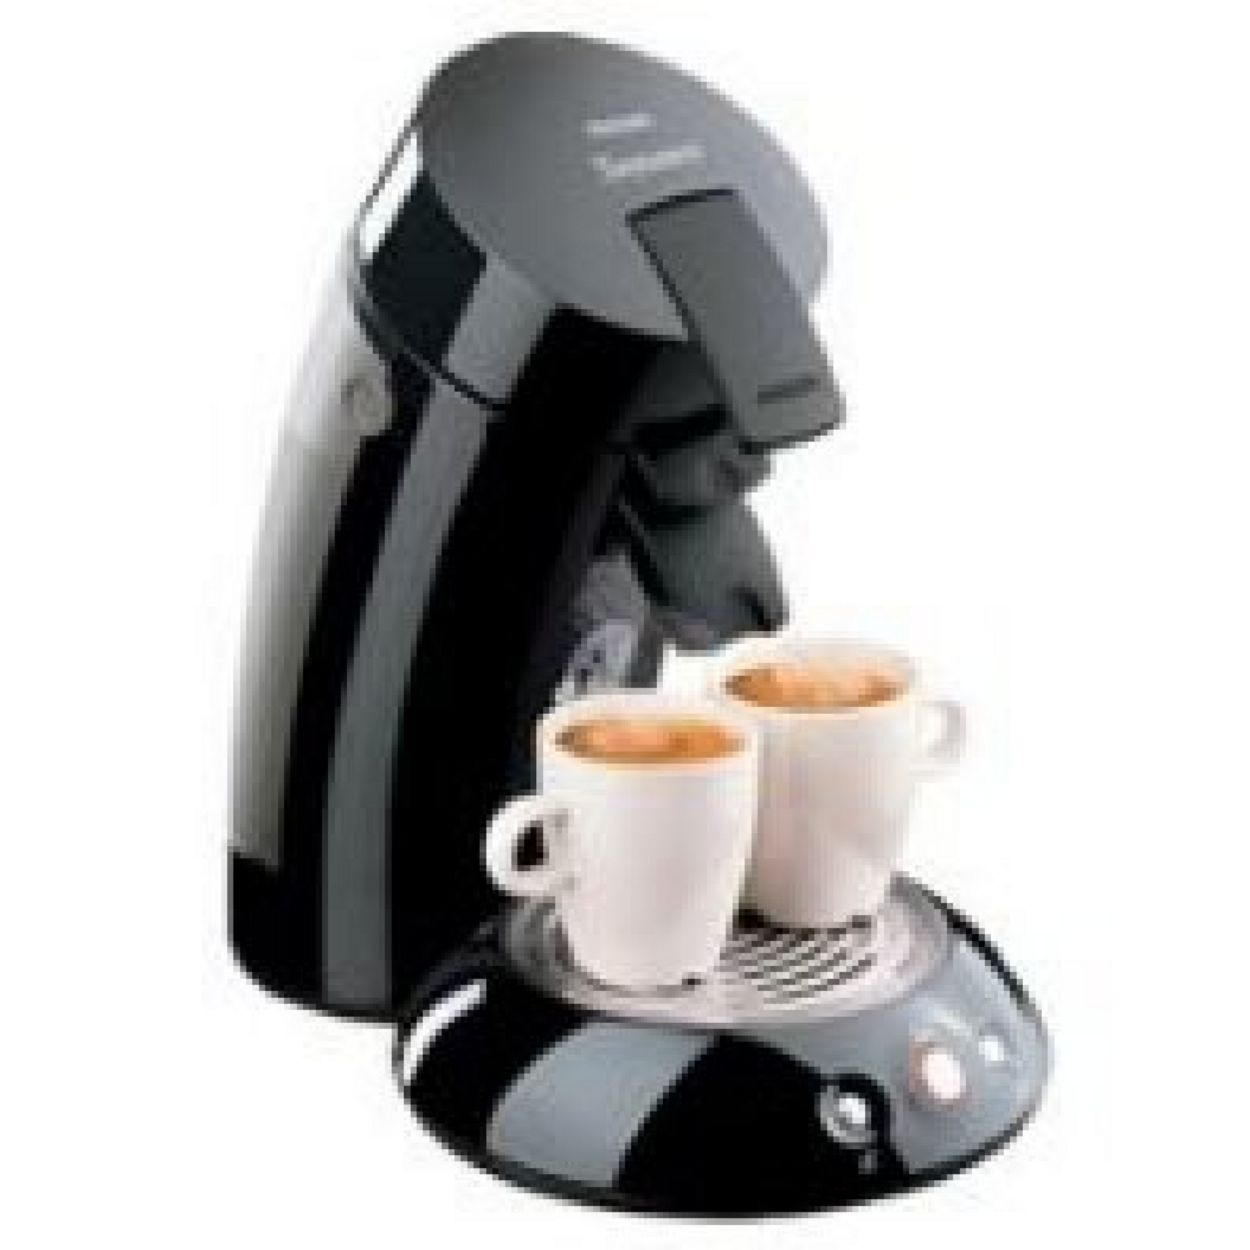 Electronic Best Coffee Pod Machines coffee pod machine hd781065 single serve gourmet coffee